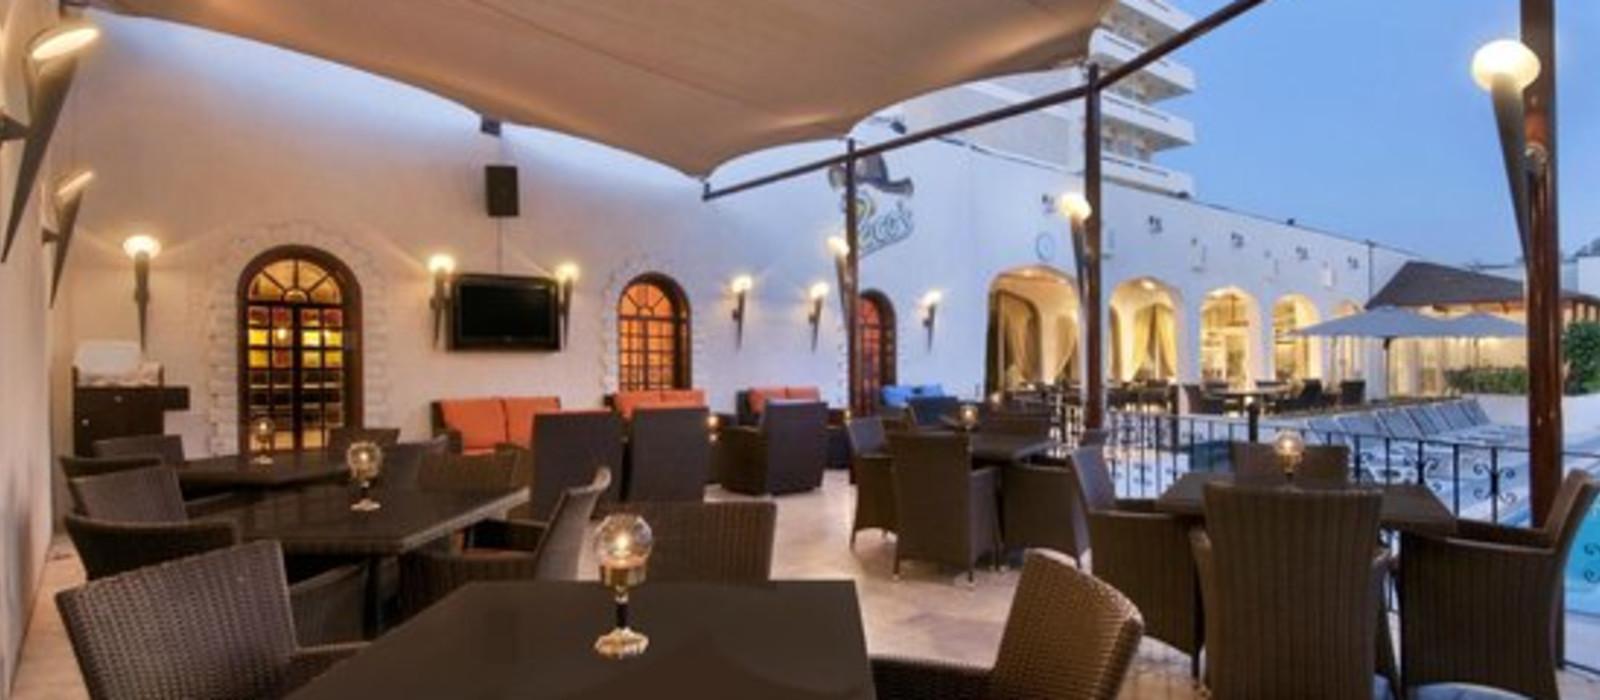 Hotel Radisson Blue  & Resort, Al Ain United Arab Emirates